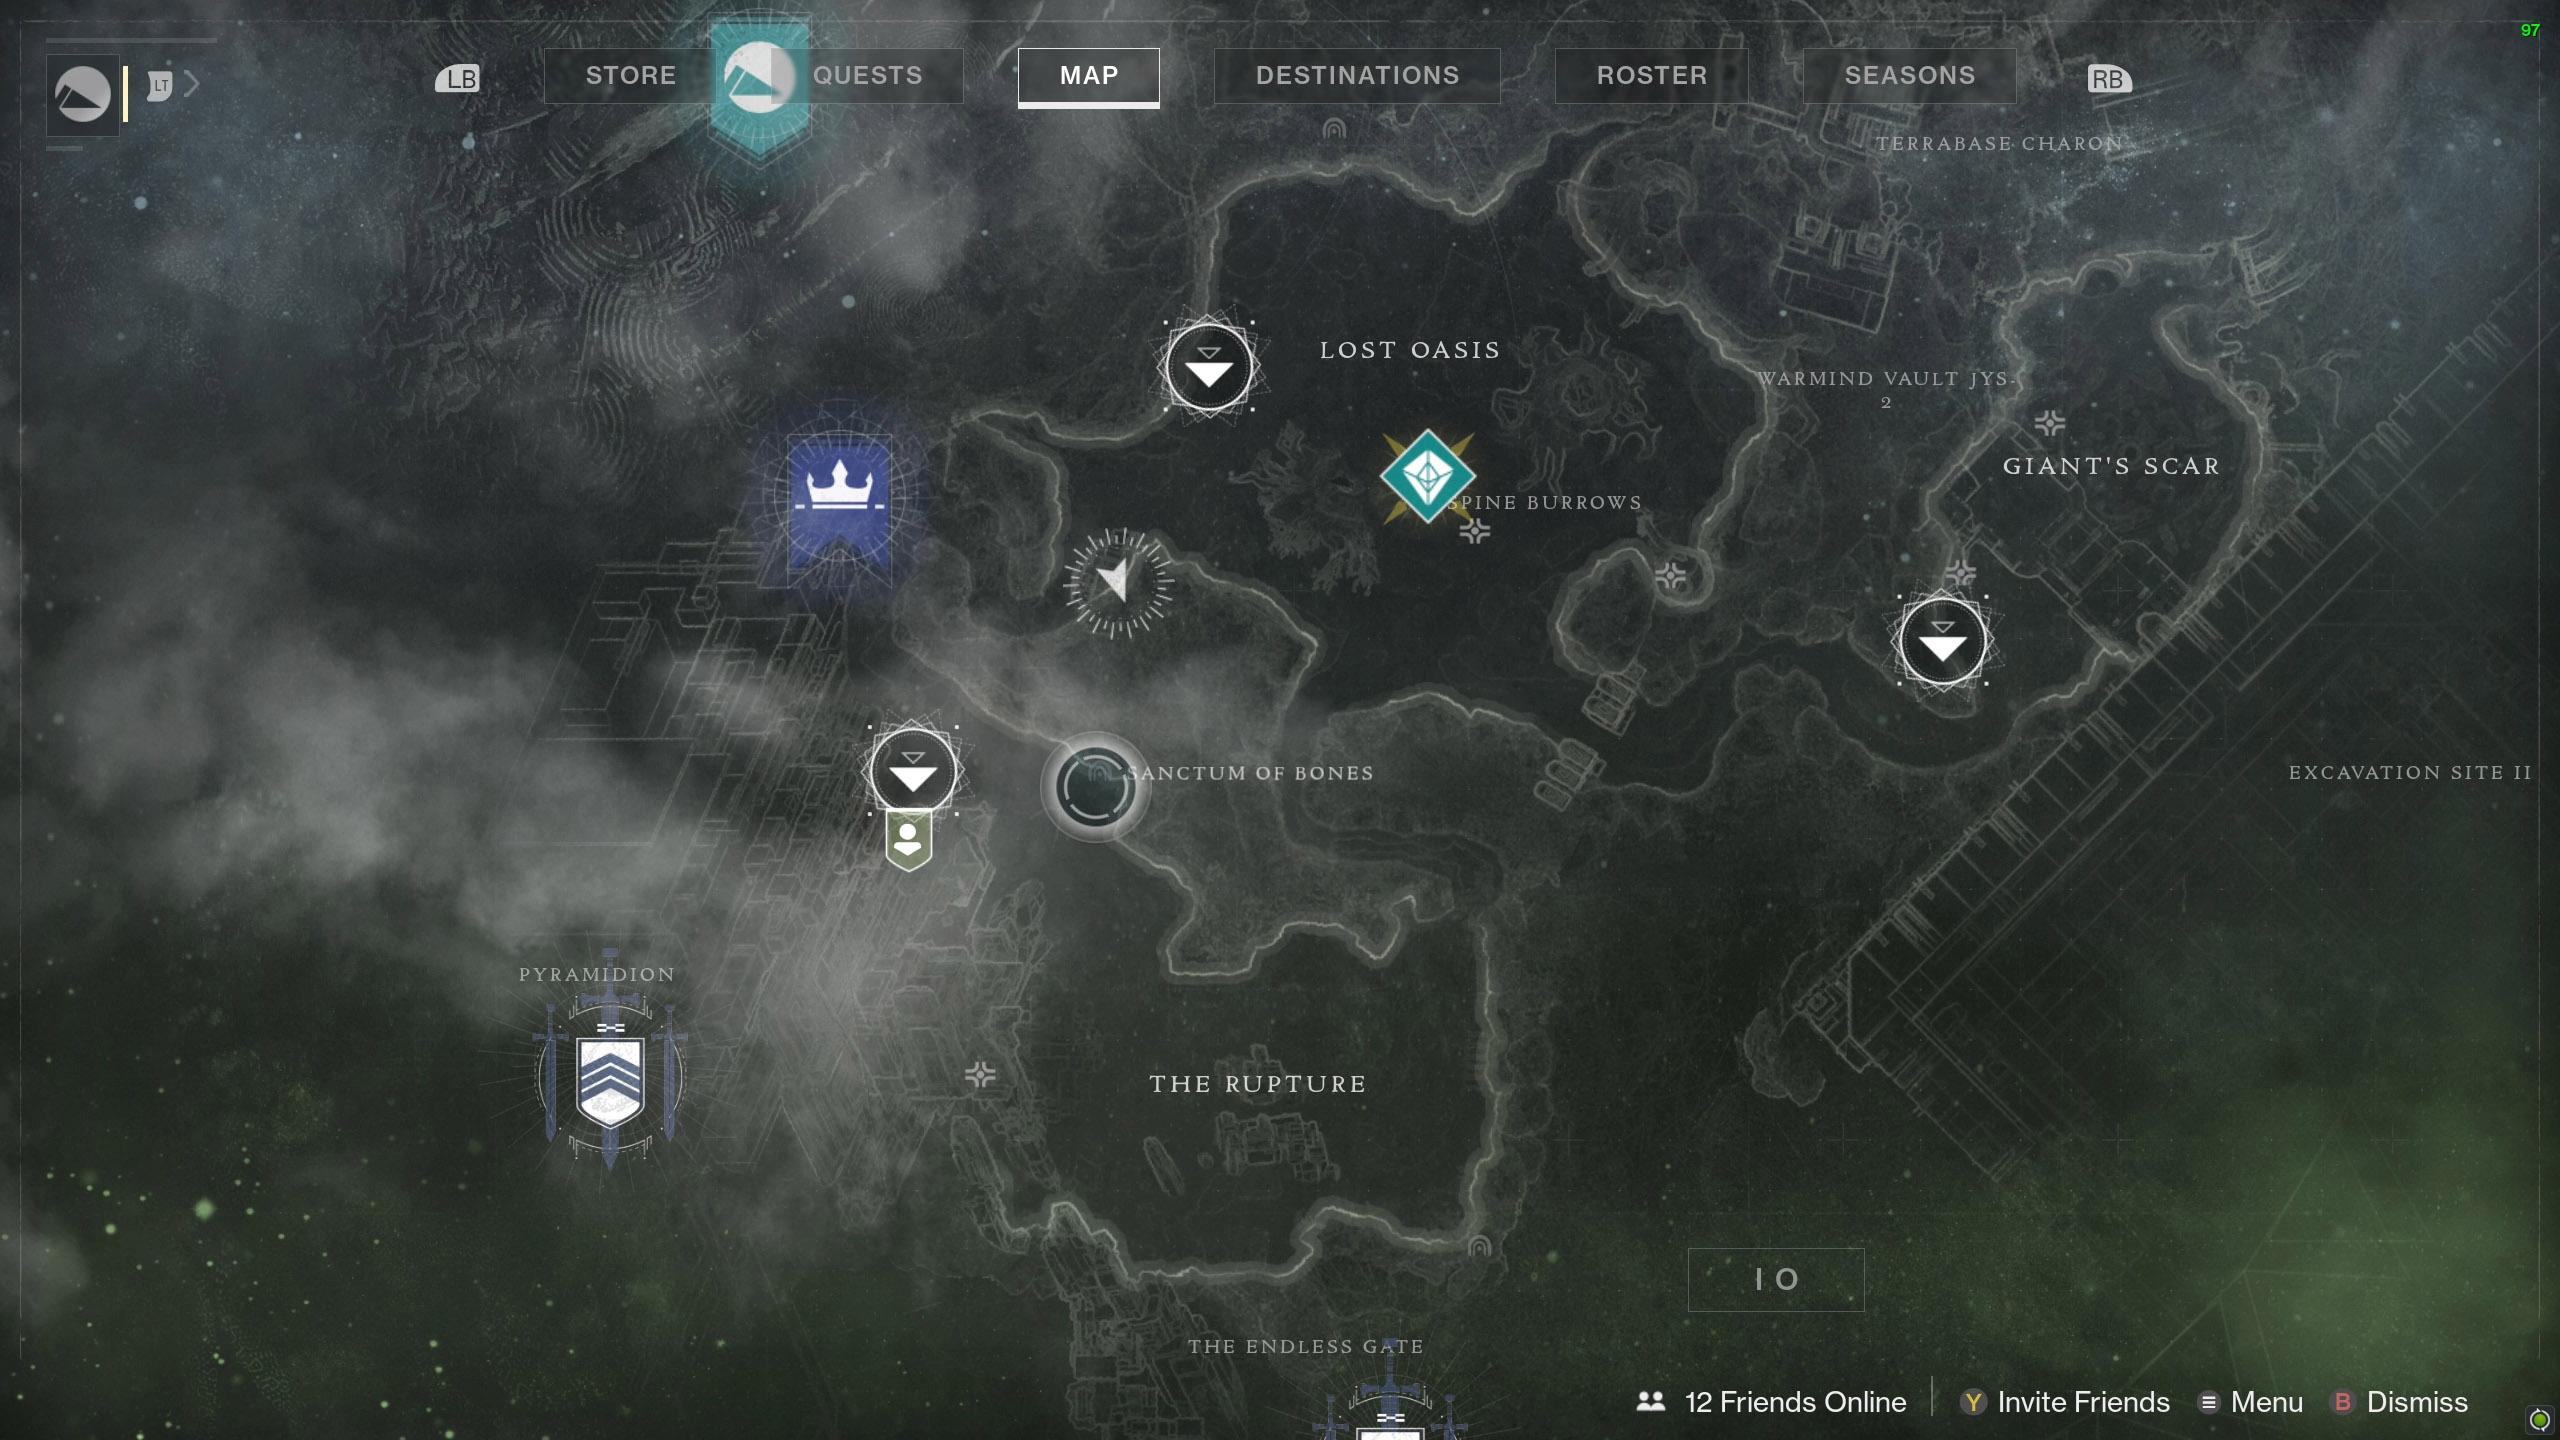 Destiny 2 Savanthuns Eyes Io Sanctum of Bones map